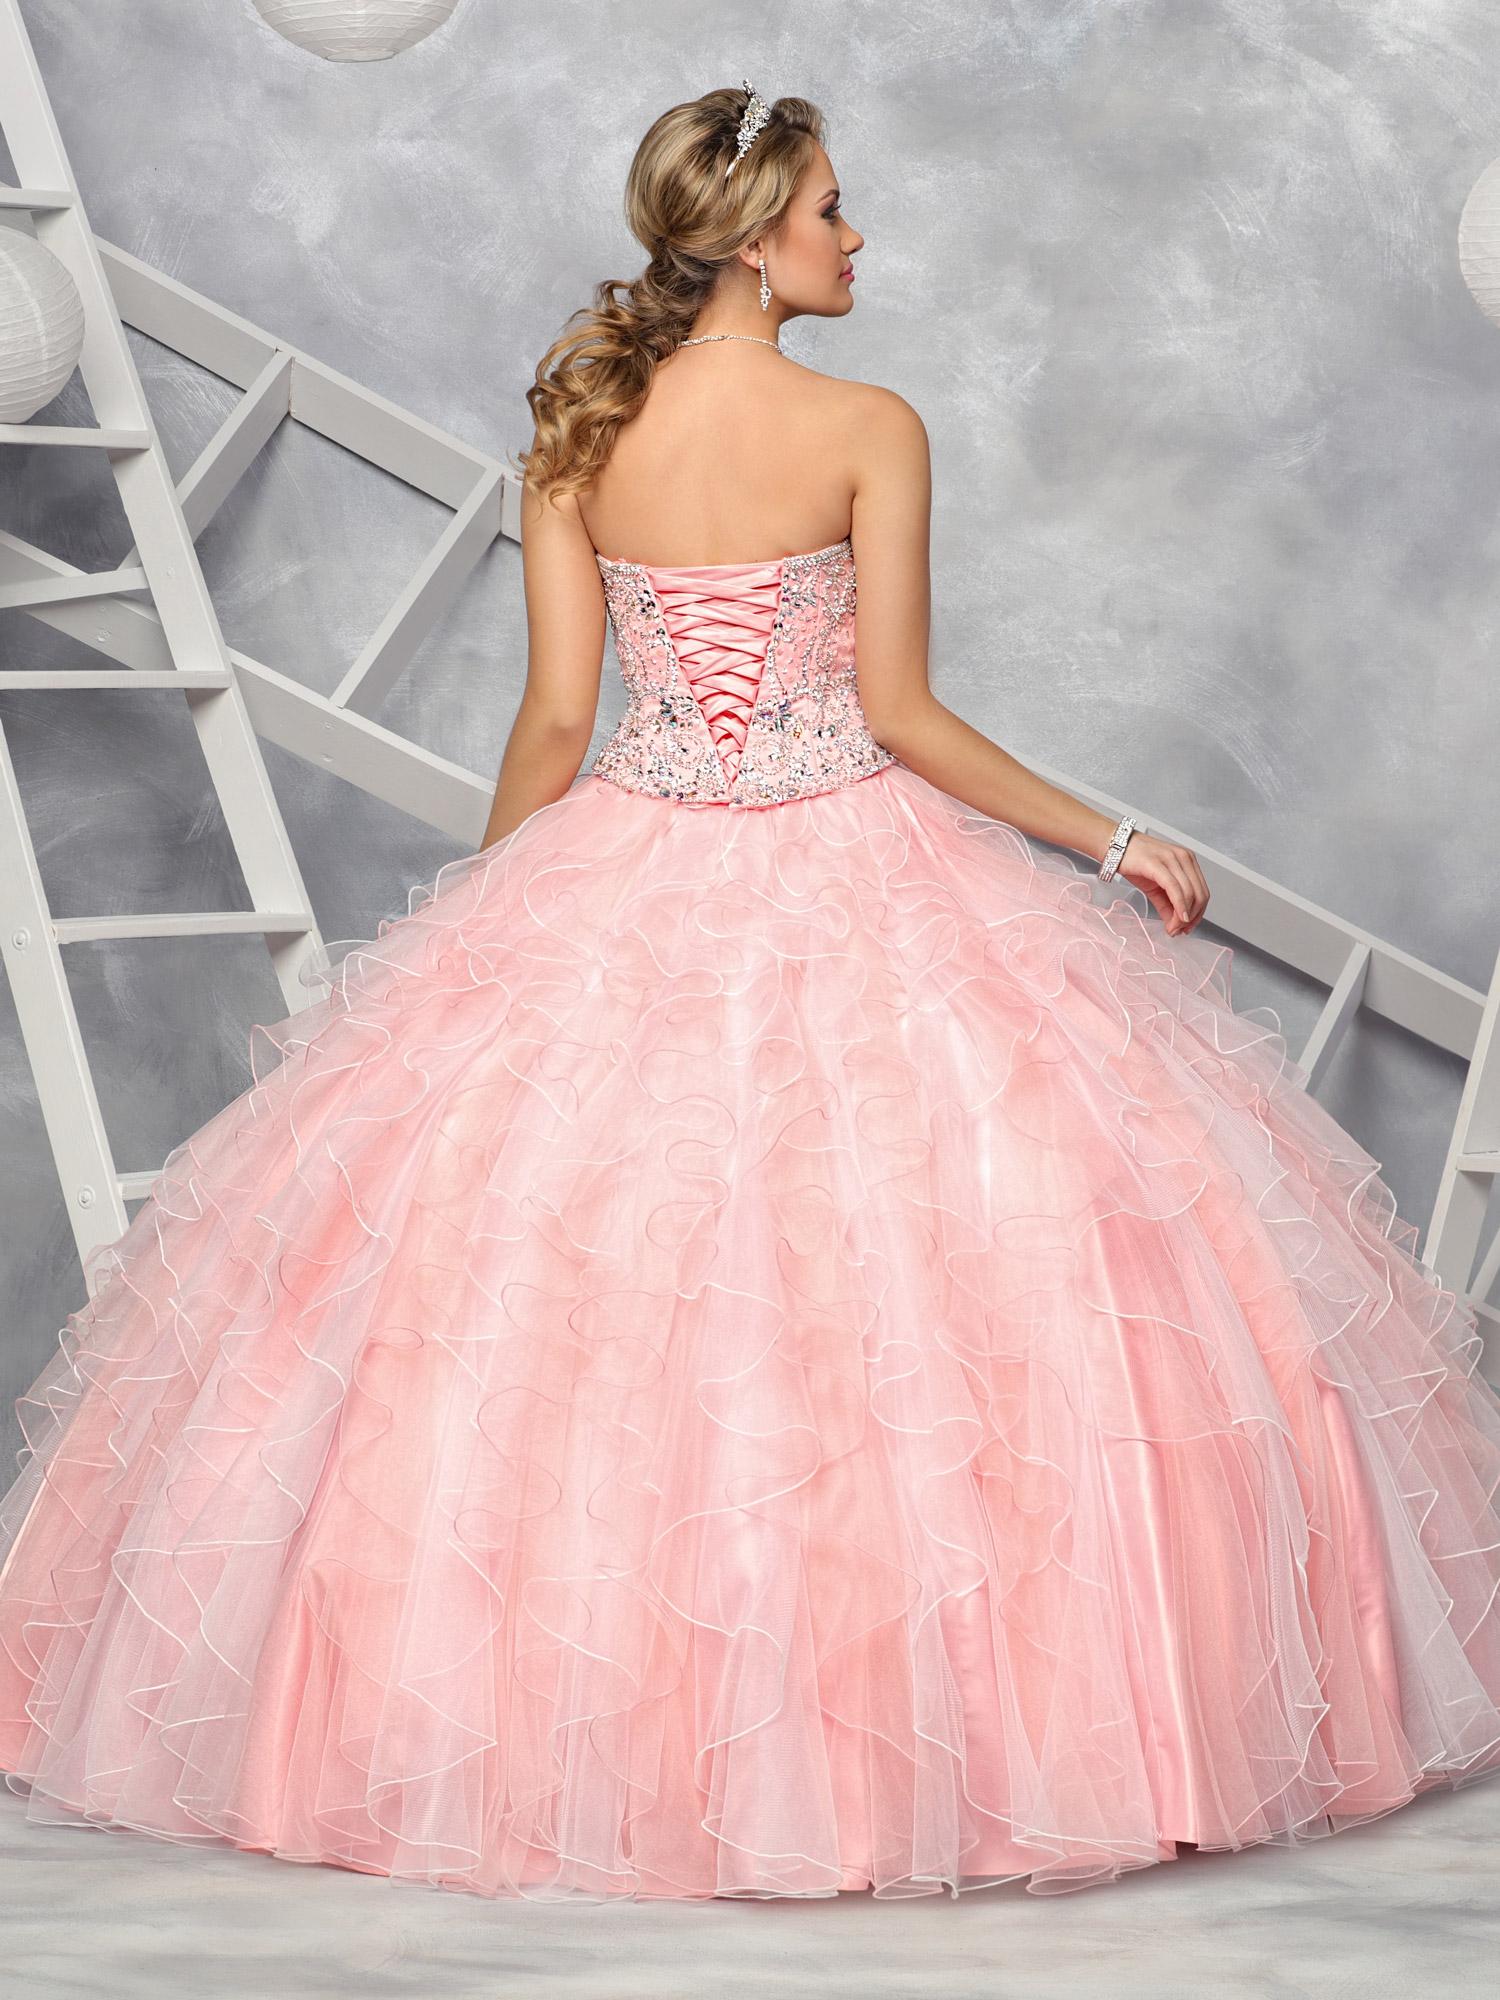 Style #80342 | DaVinci Wedding Dresses